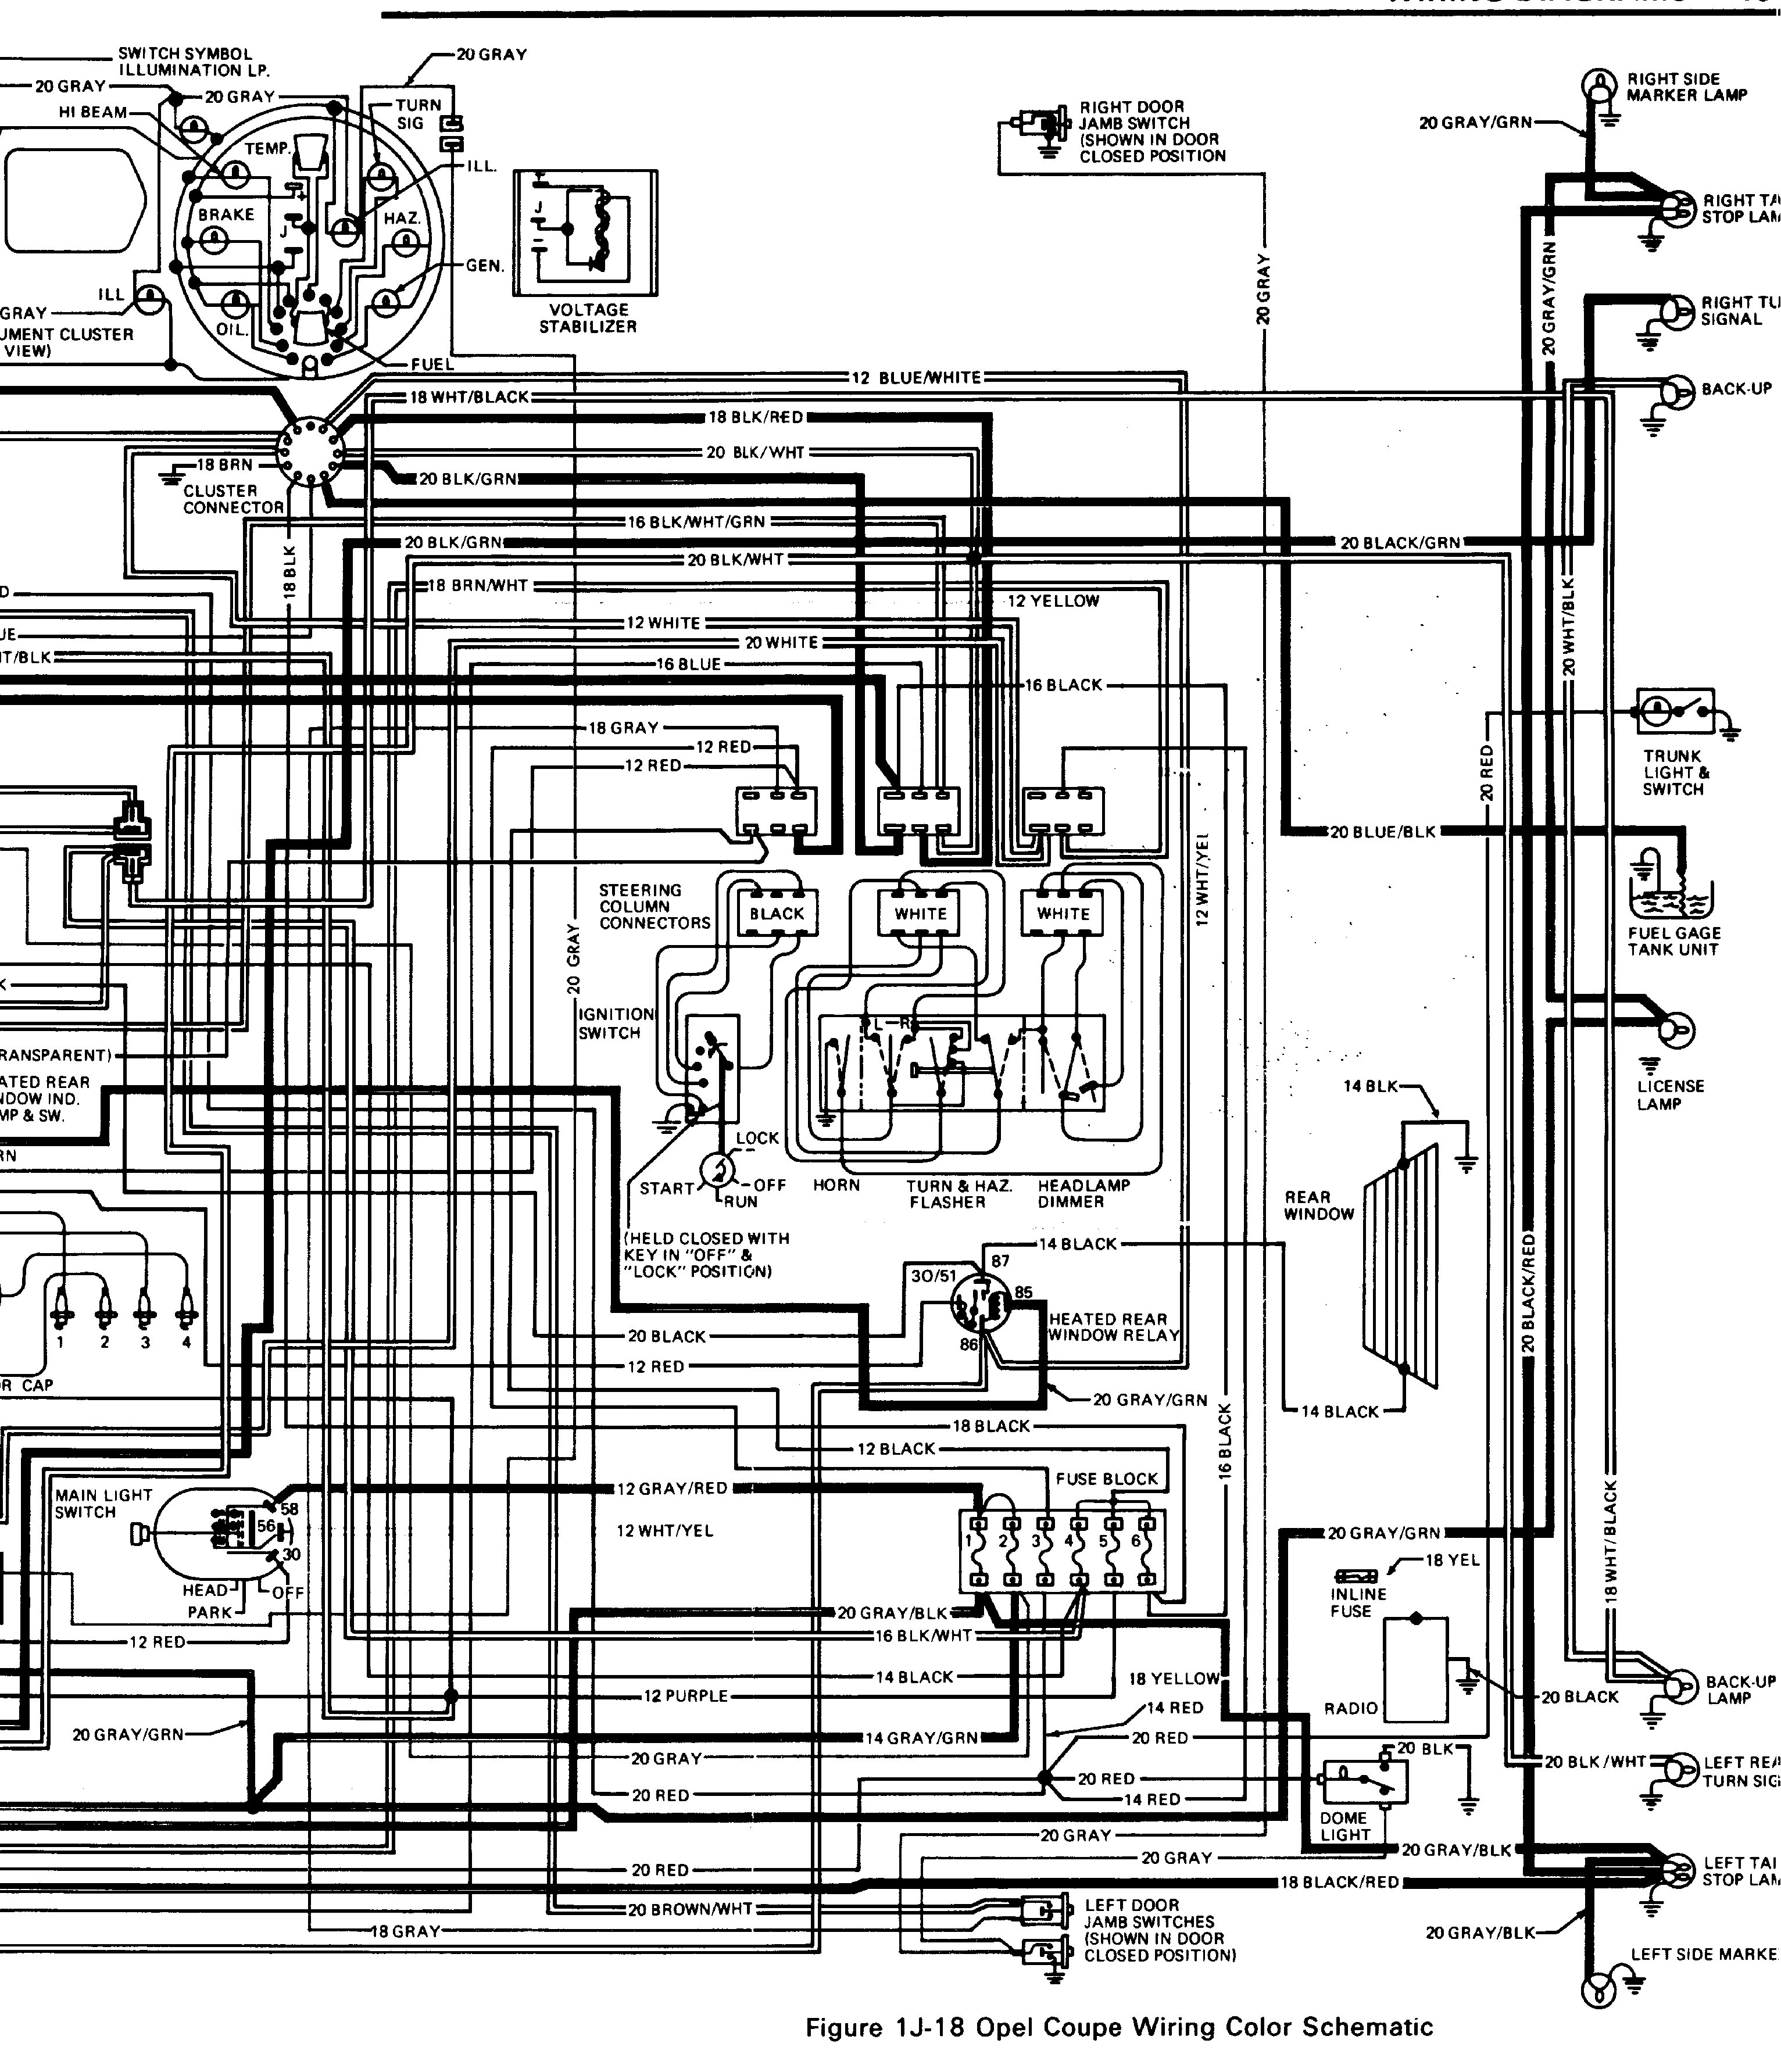 Wiring Diagram Zafira A Pdf Vauxhall Remote Starter Diagram G35 Fuse Diagram Bonek Of Wiring Diagram Zafira A Pdf